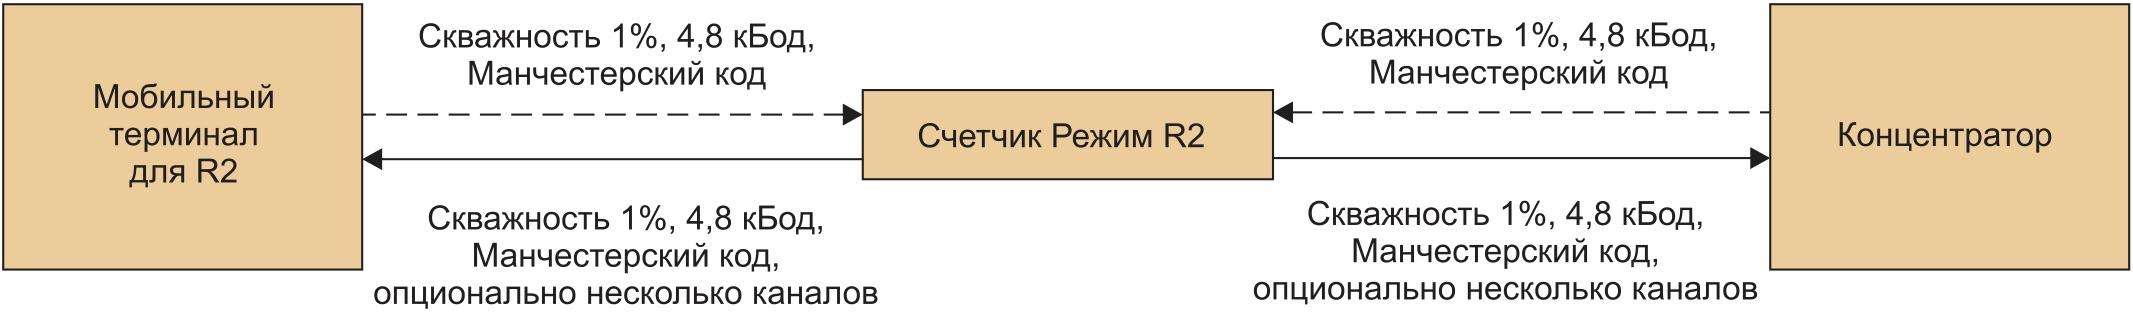 Режим R2 стандарта EN 13757-4:2010